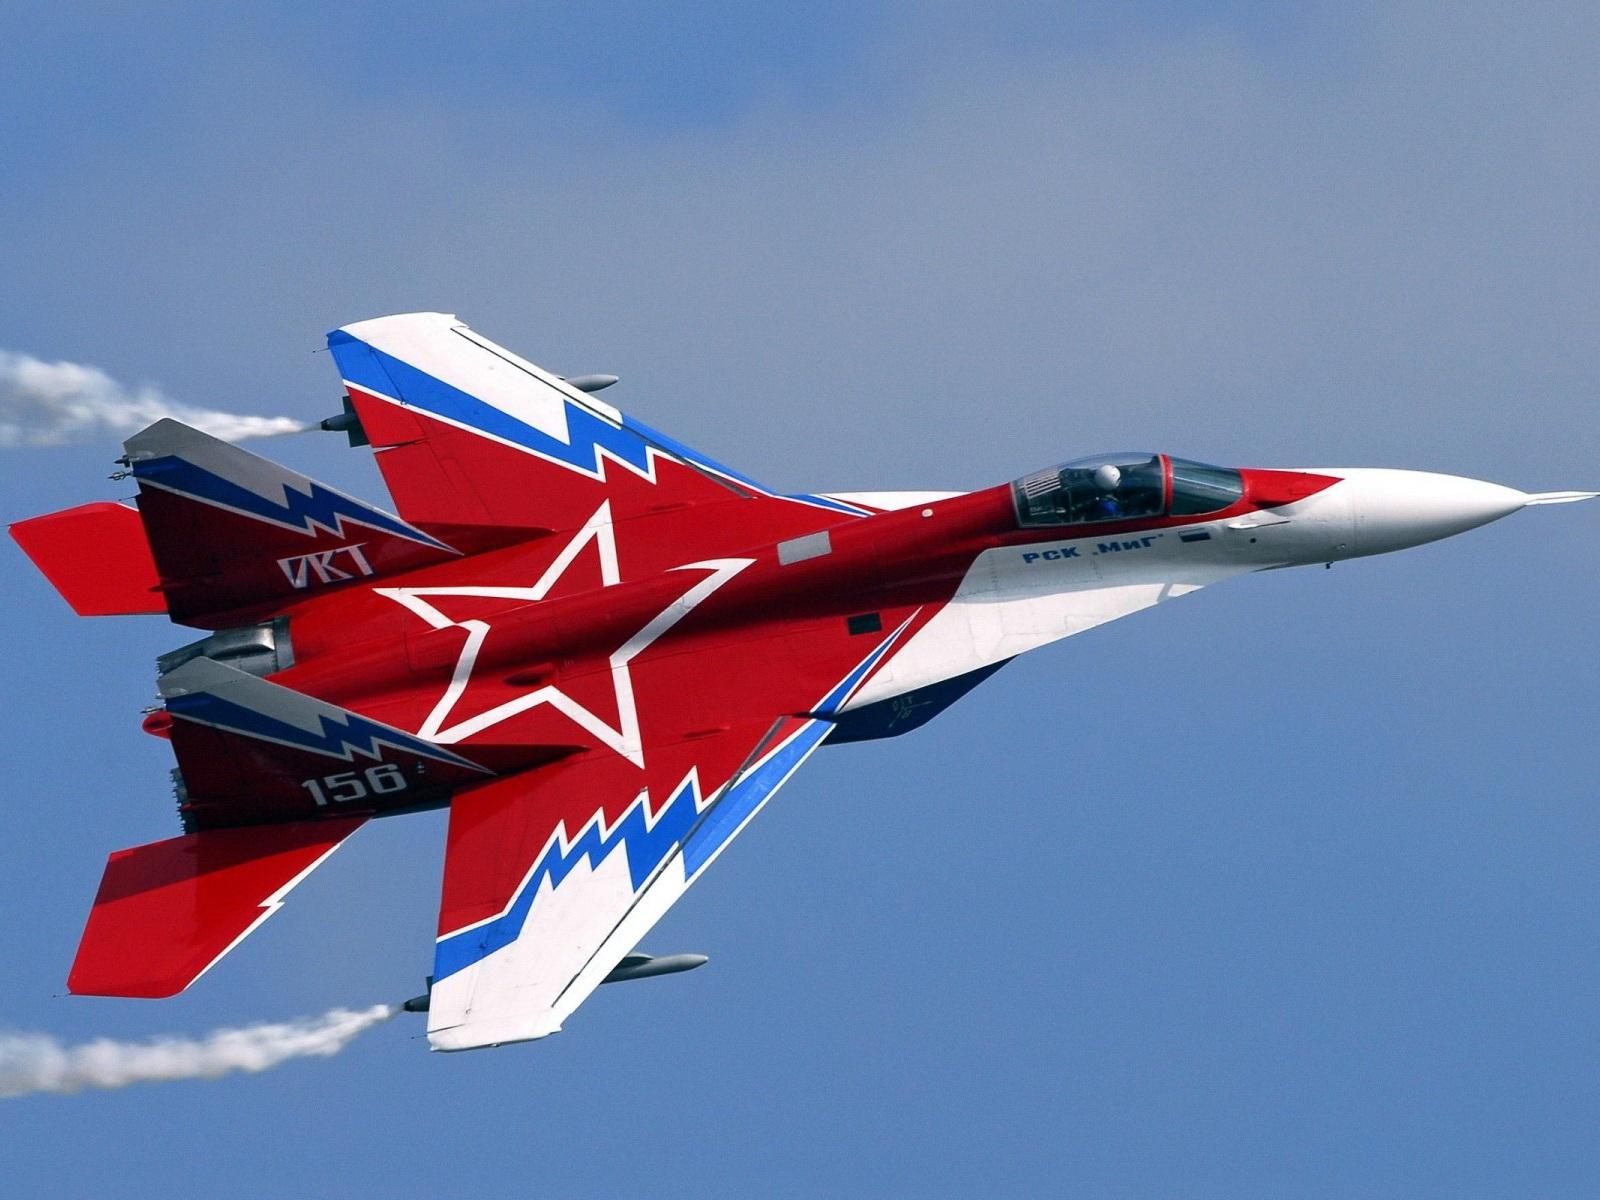 Обои F-35a, истребители, Thunderbird. Авиация foto 17